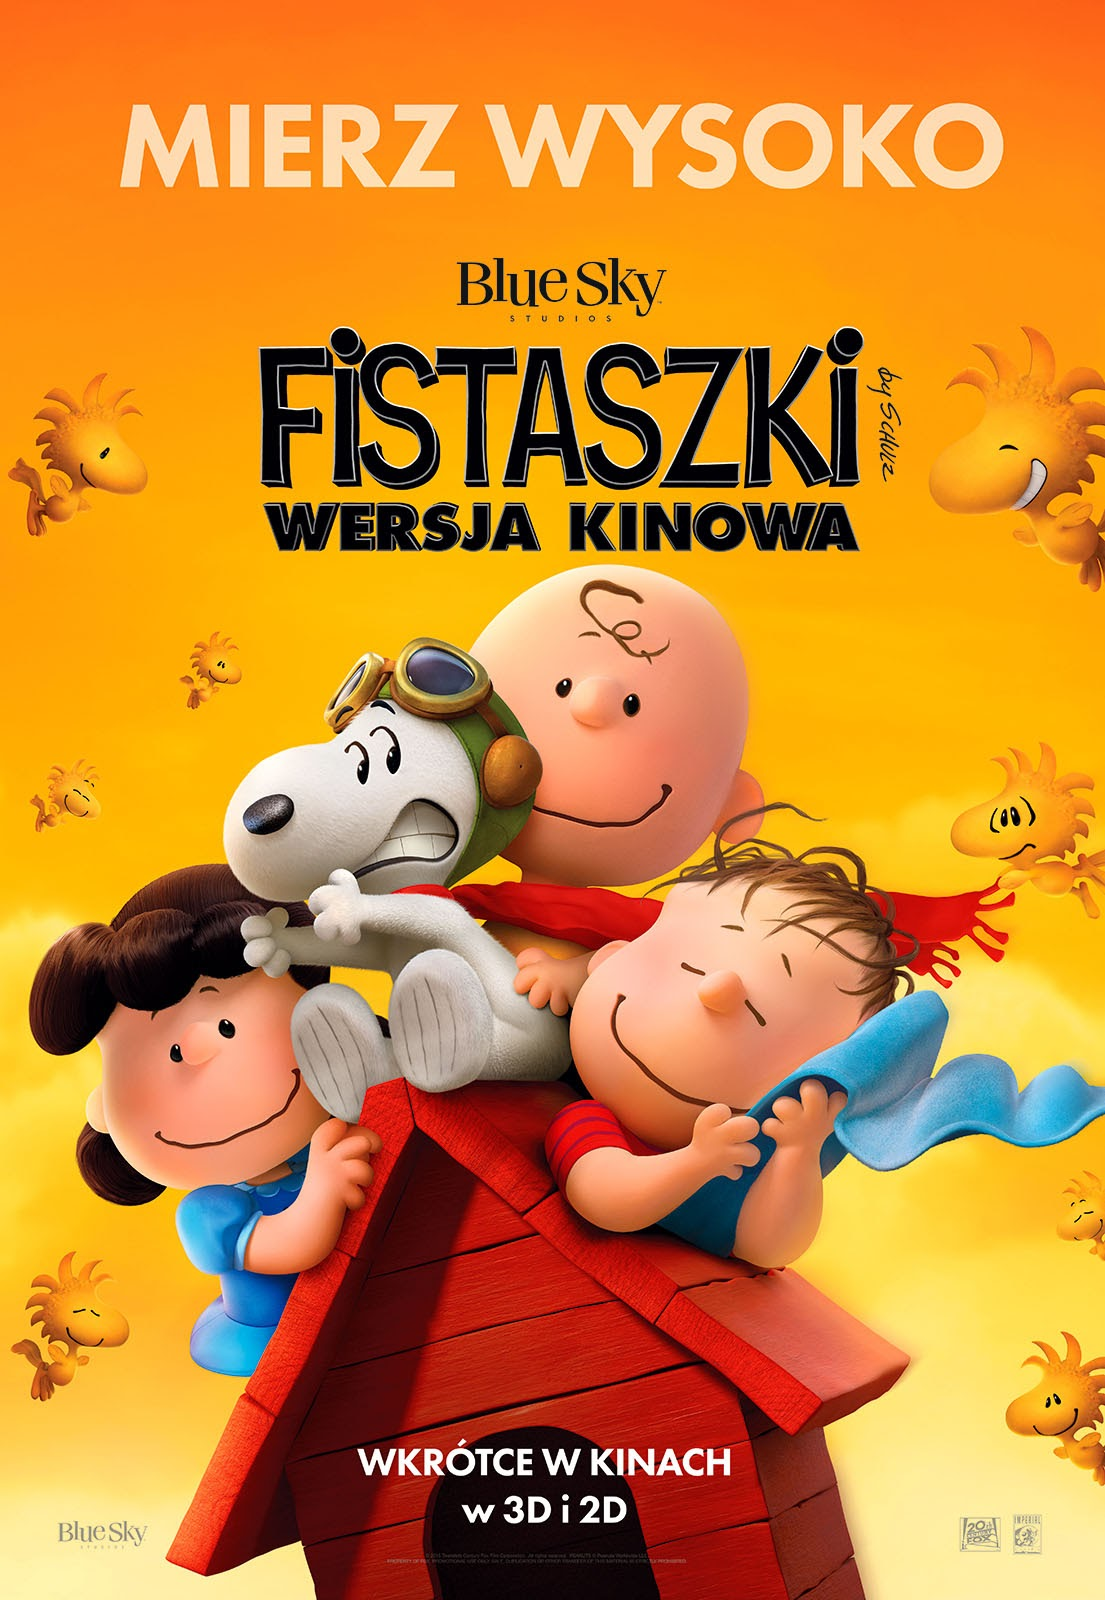 Polski plakat filmu 'Fistaszki - Wersja Kinowa'